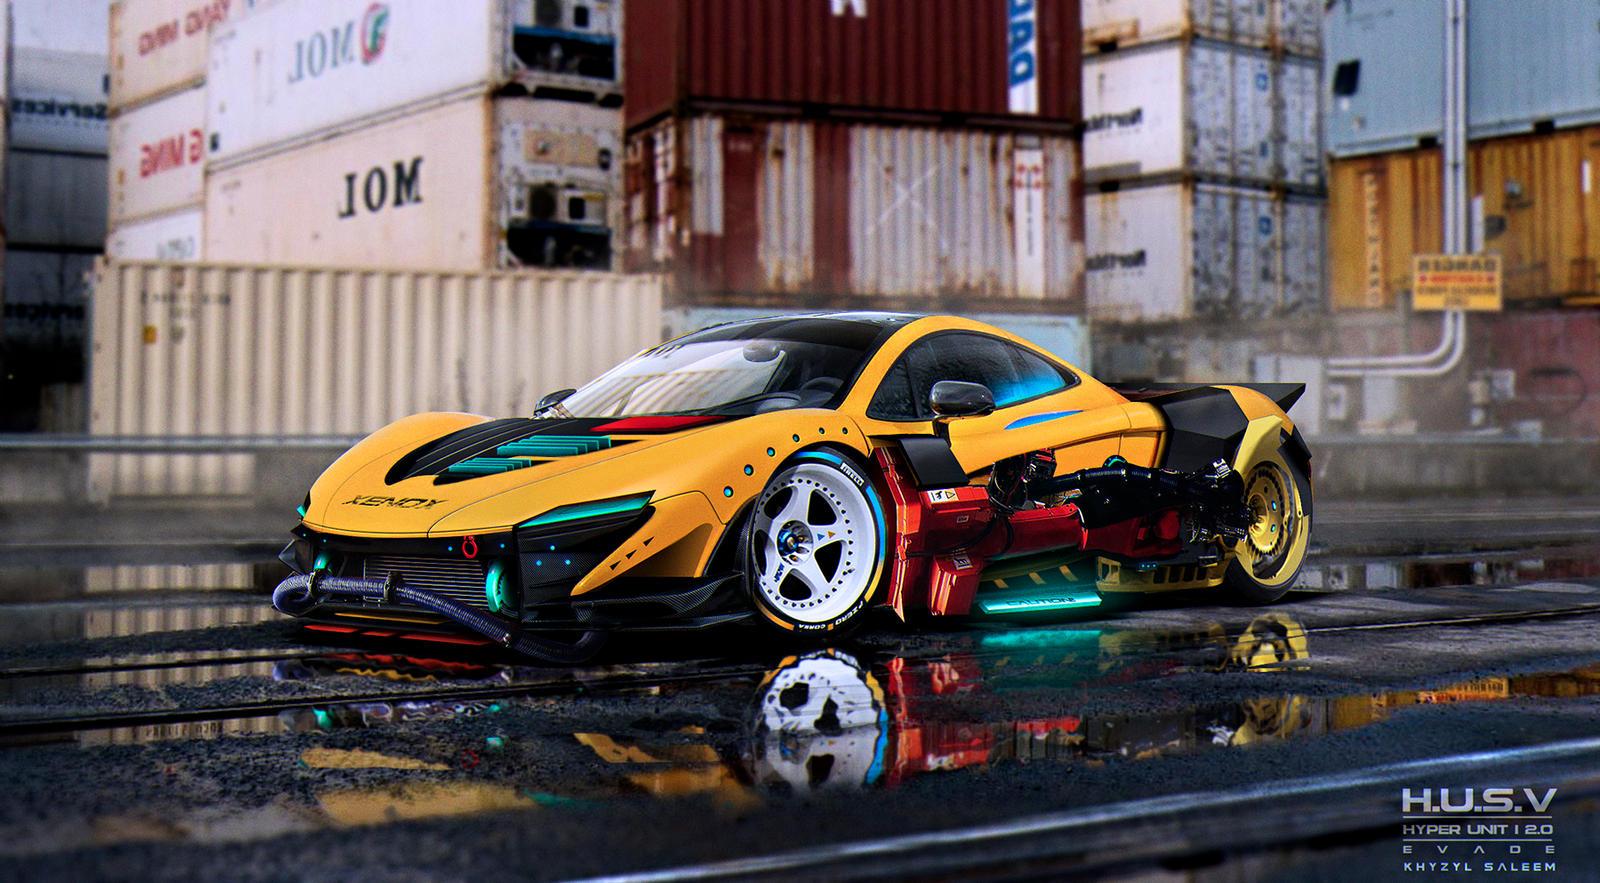 McLaren P1 | H.U.S.V | EVADE Mockup by The--Kyza